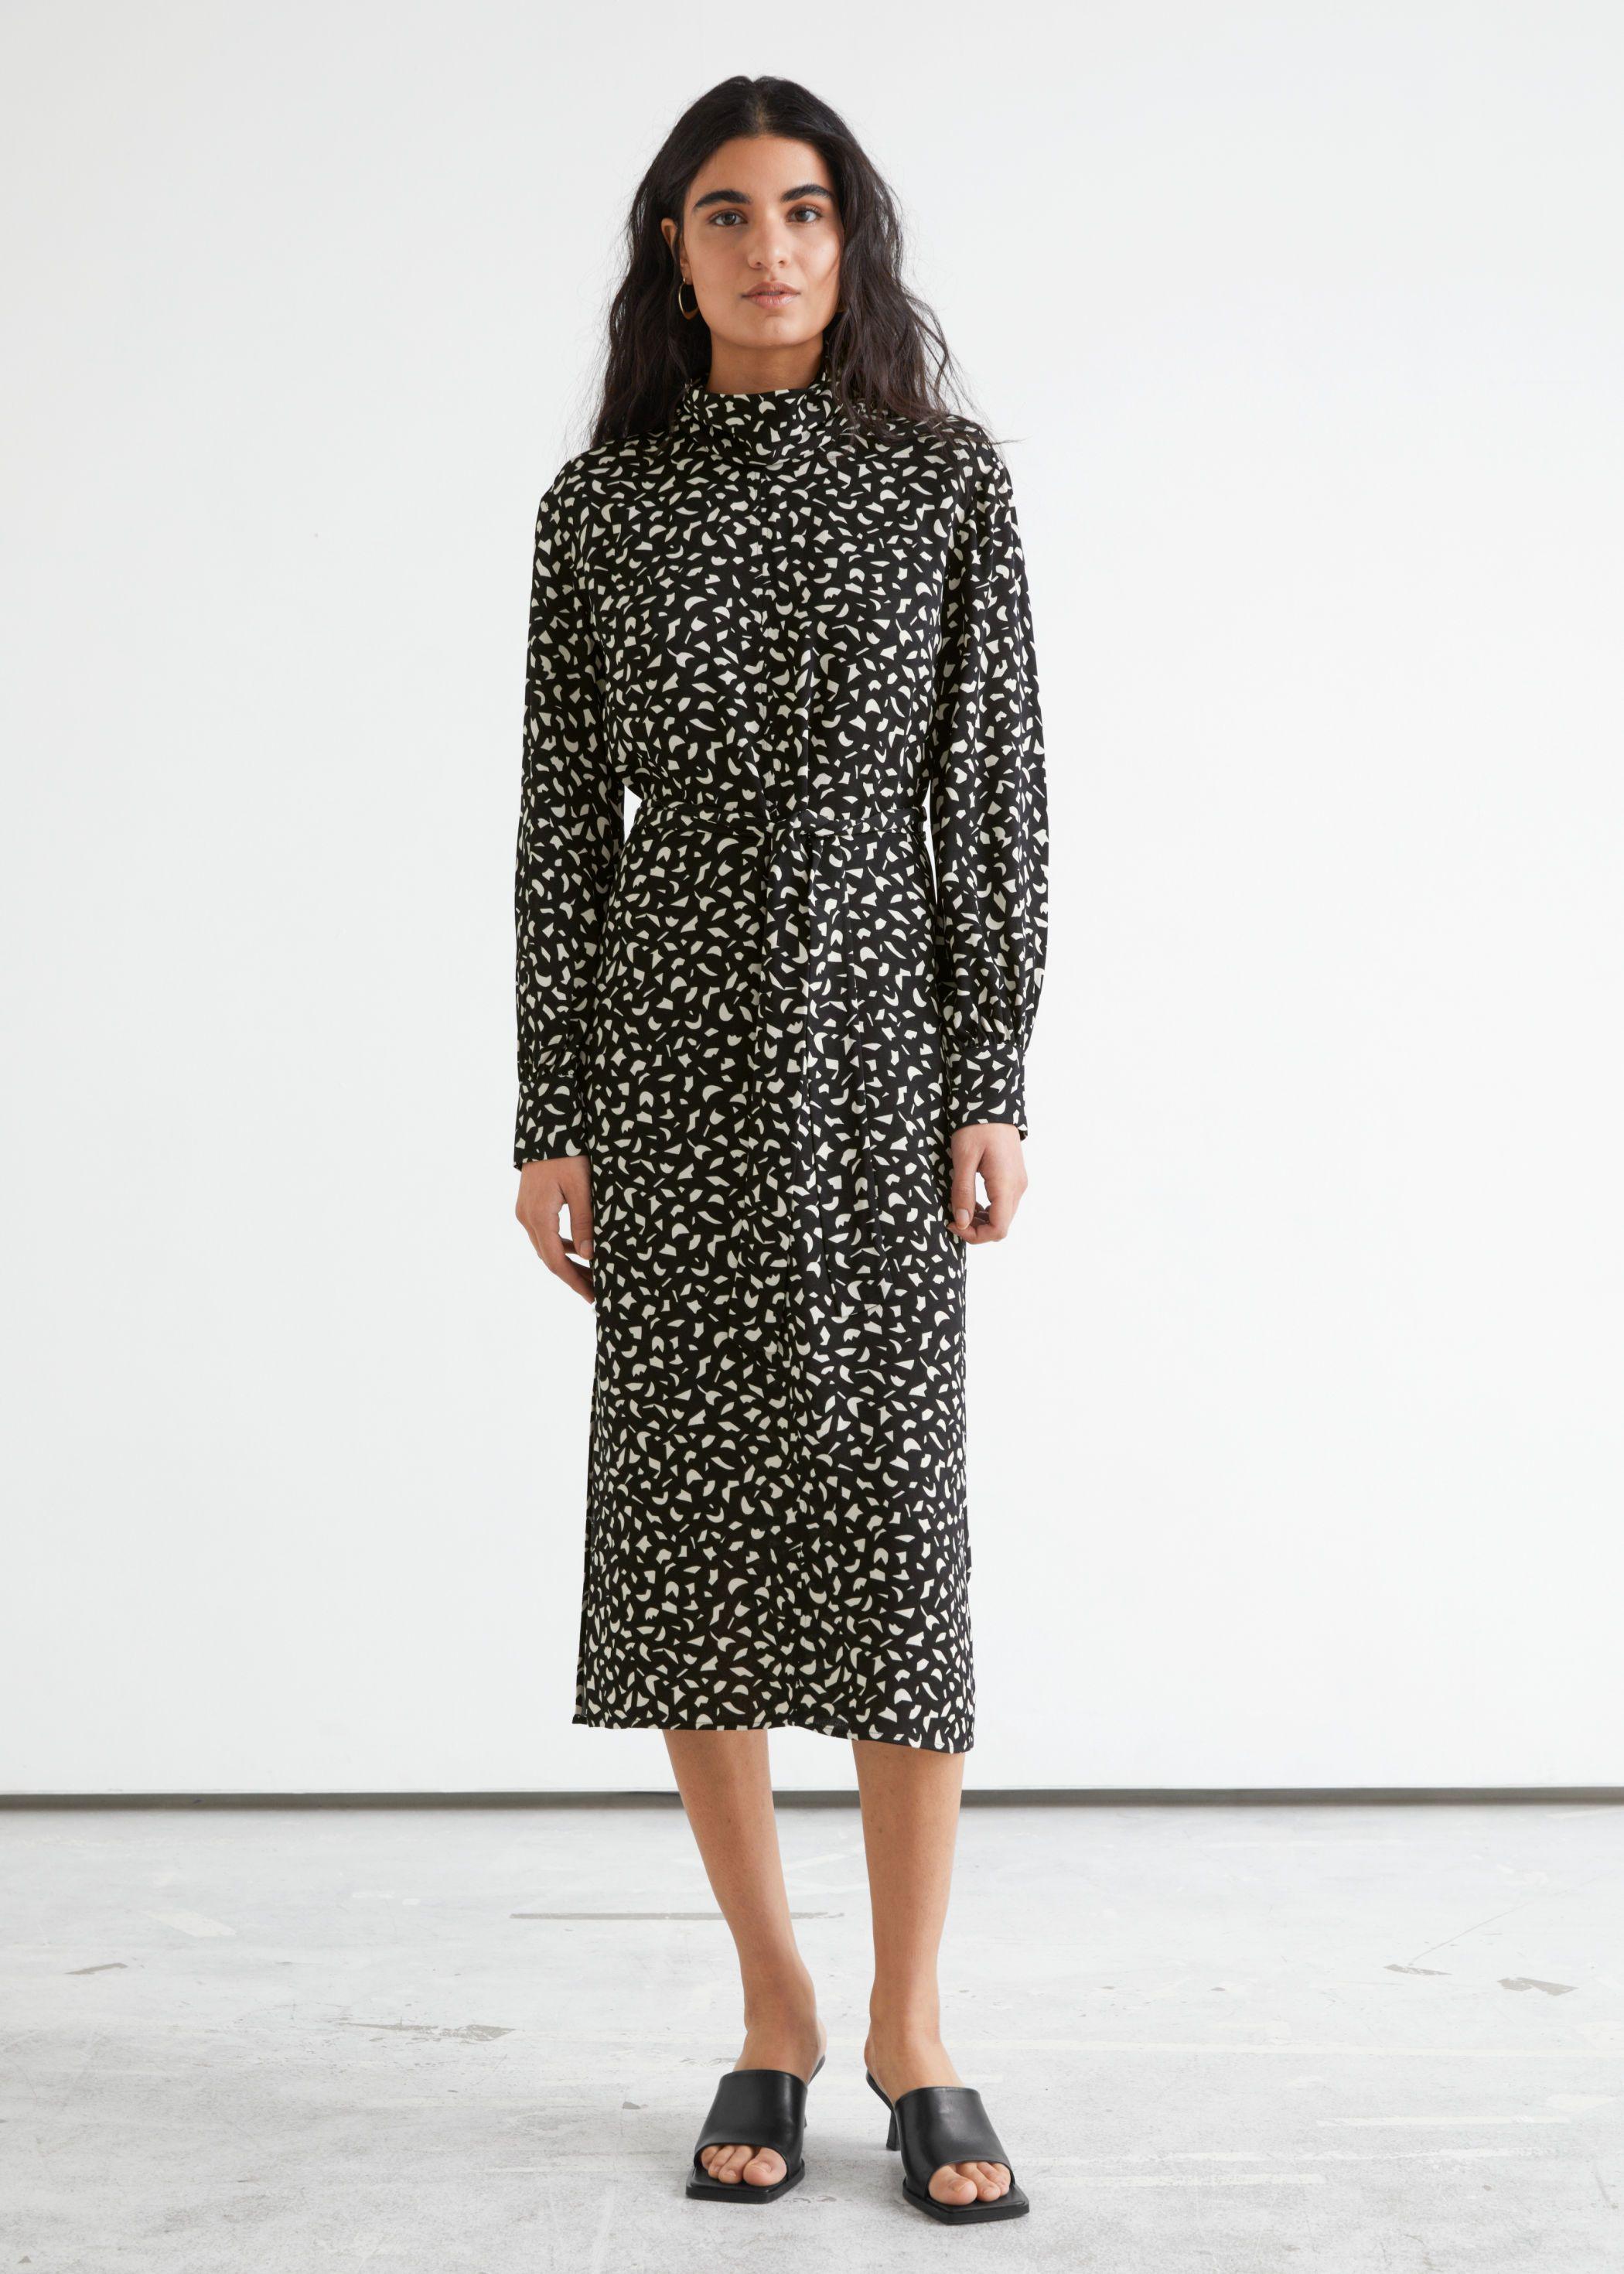 Belted Turtleneck Midi Dress - Best long sleeve dress